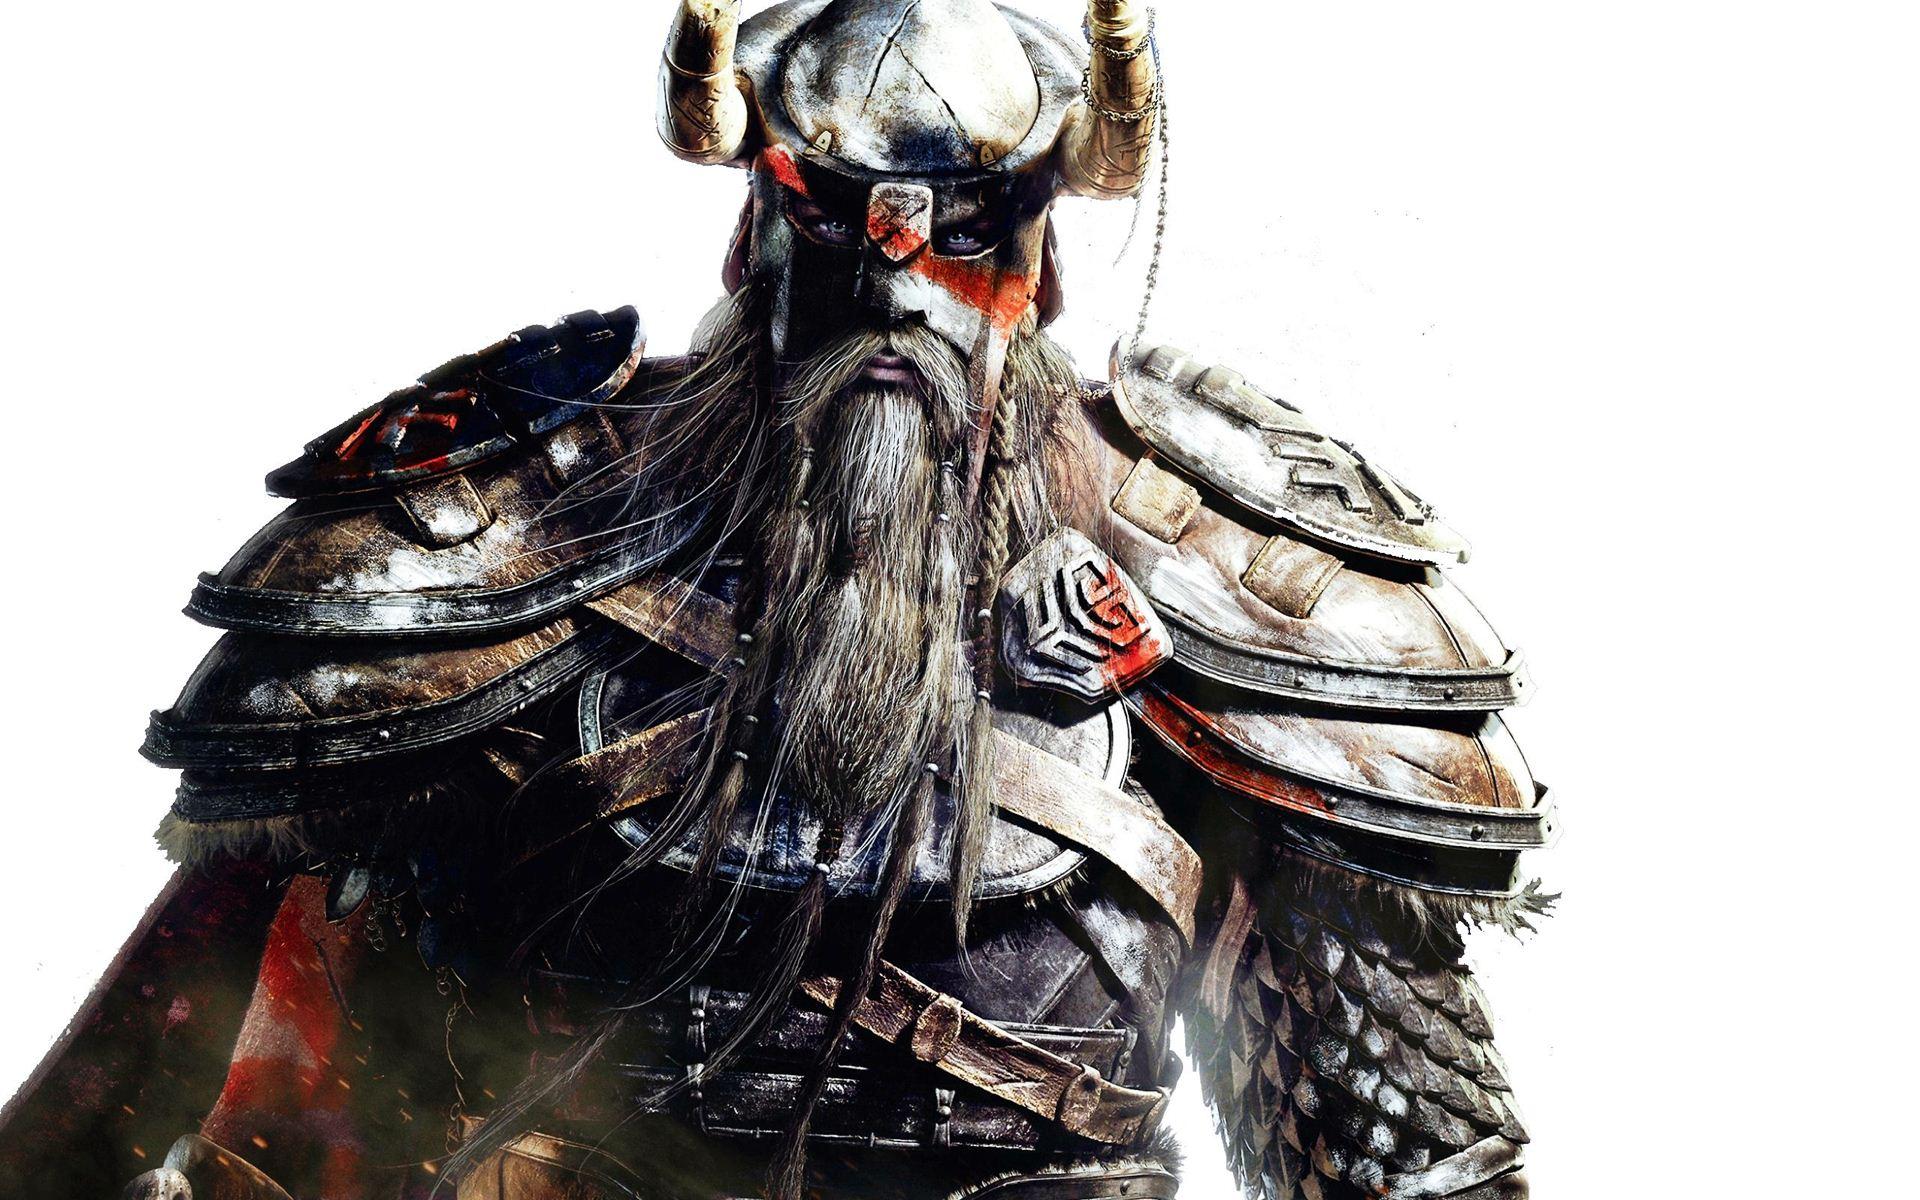 Levi Wallpaper Iphone The Elder Scrolls Online Wallpapers Pictures Images